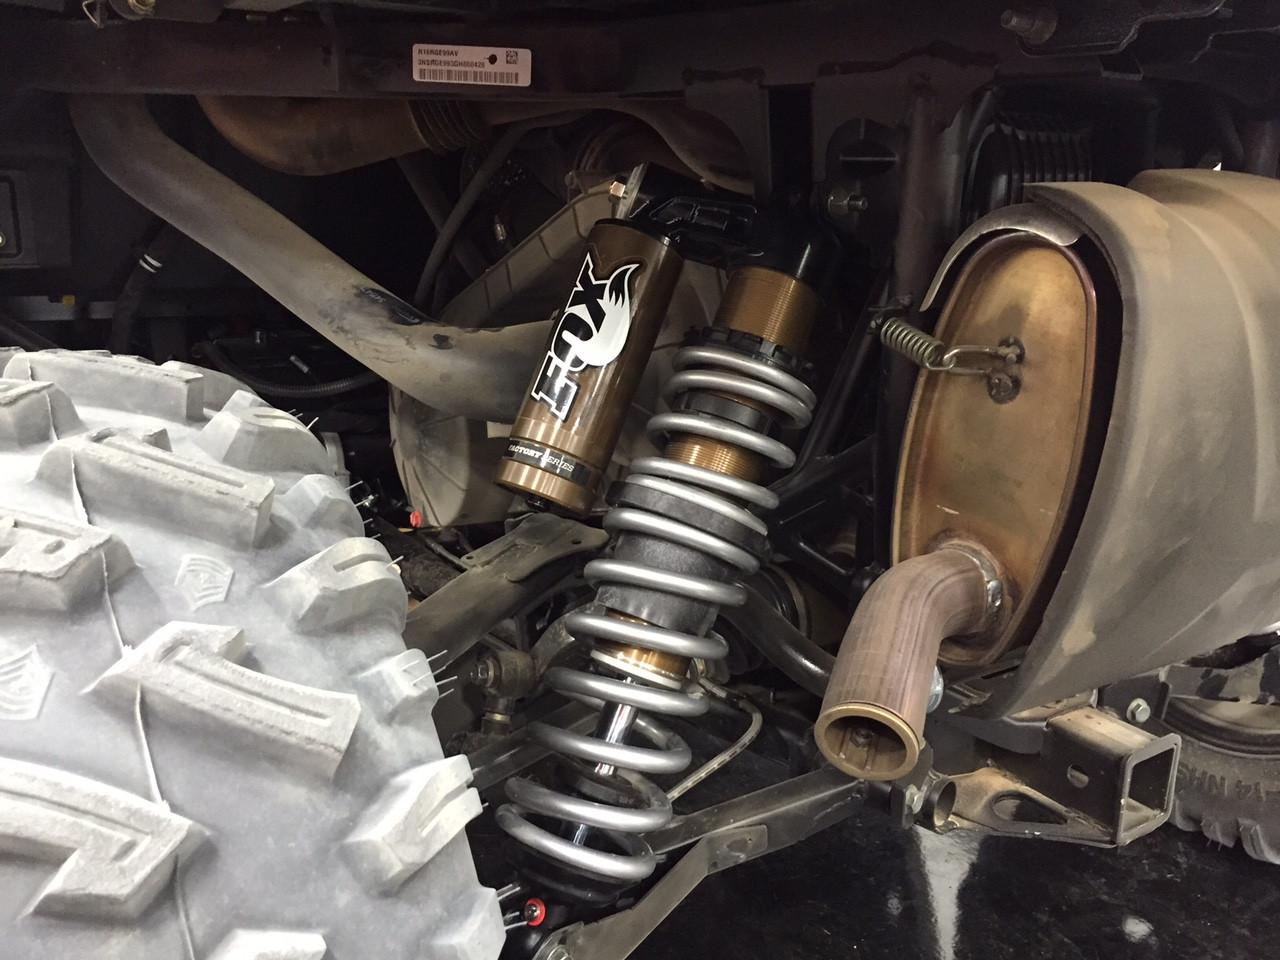 Rear shocks with standard dual rate springs